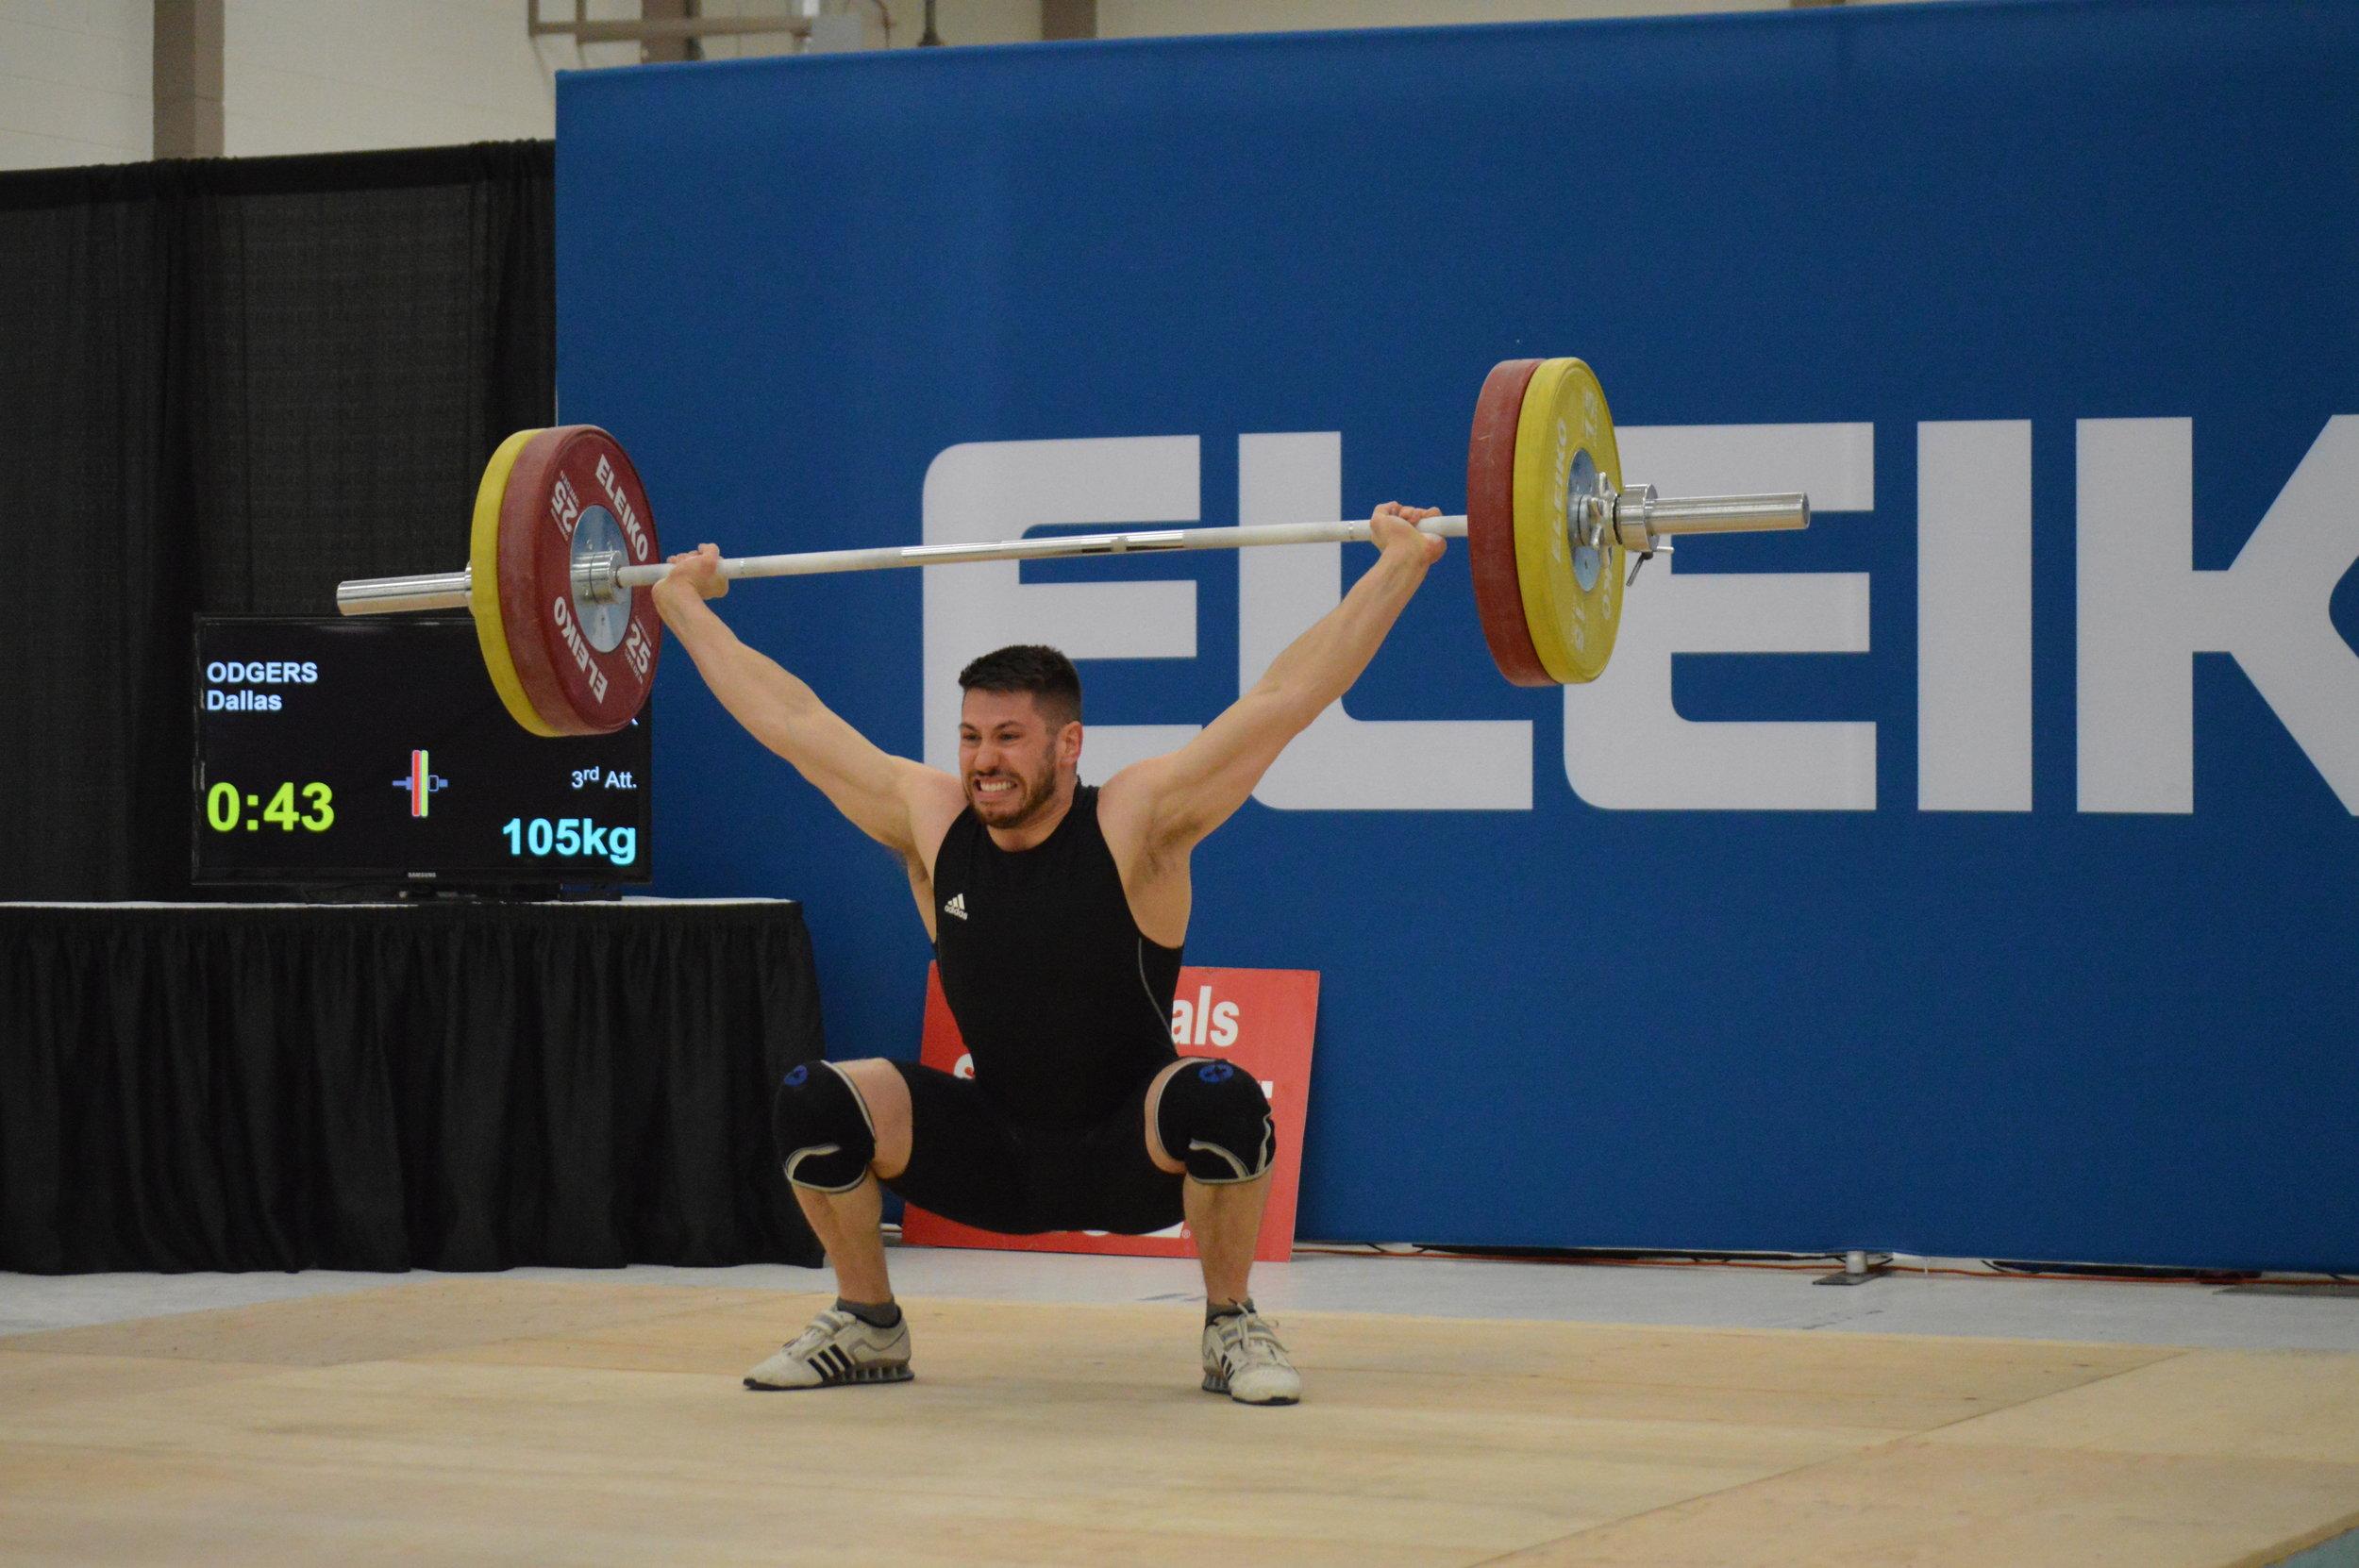 Dallas - snatch 105kg (5).JPG